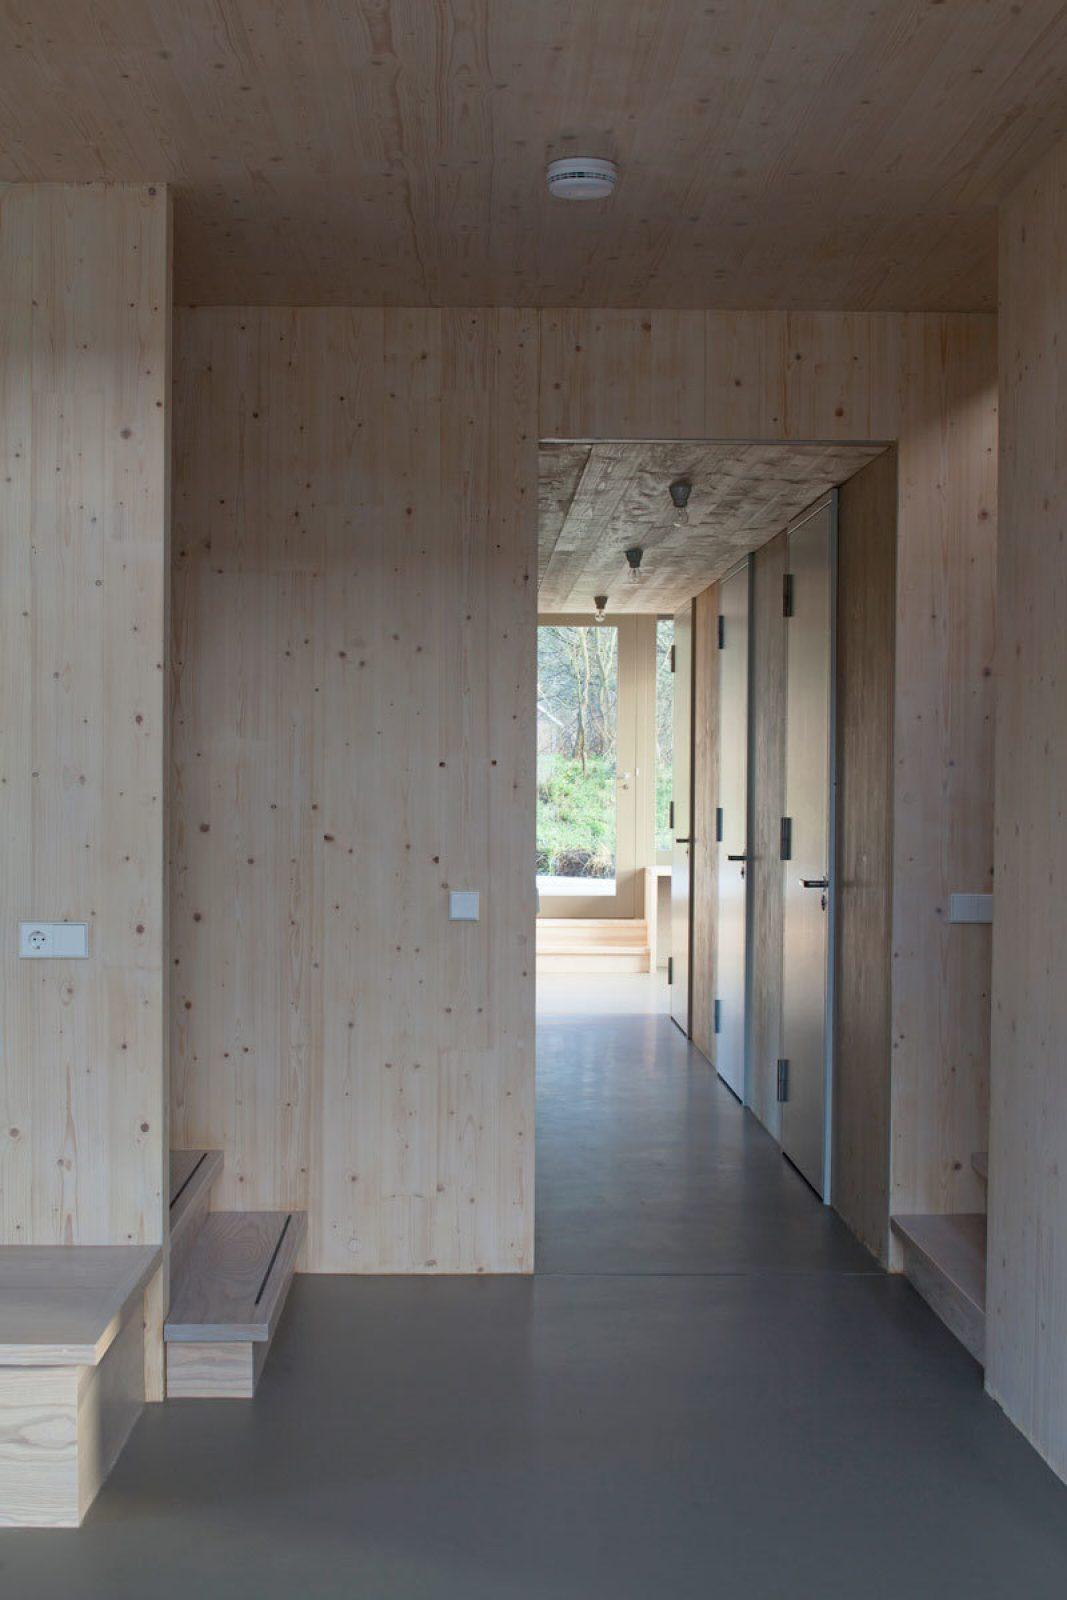 Goeree Hallway Corridor